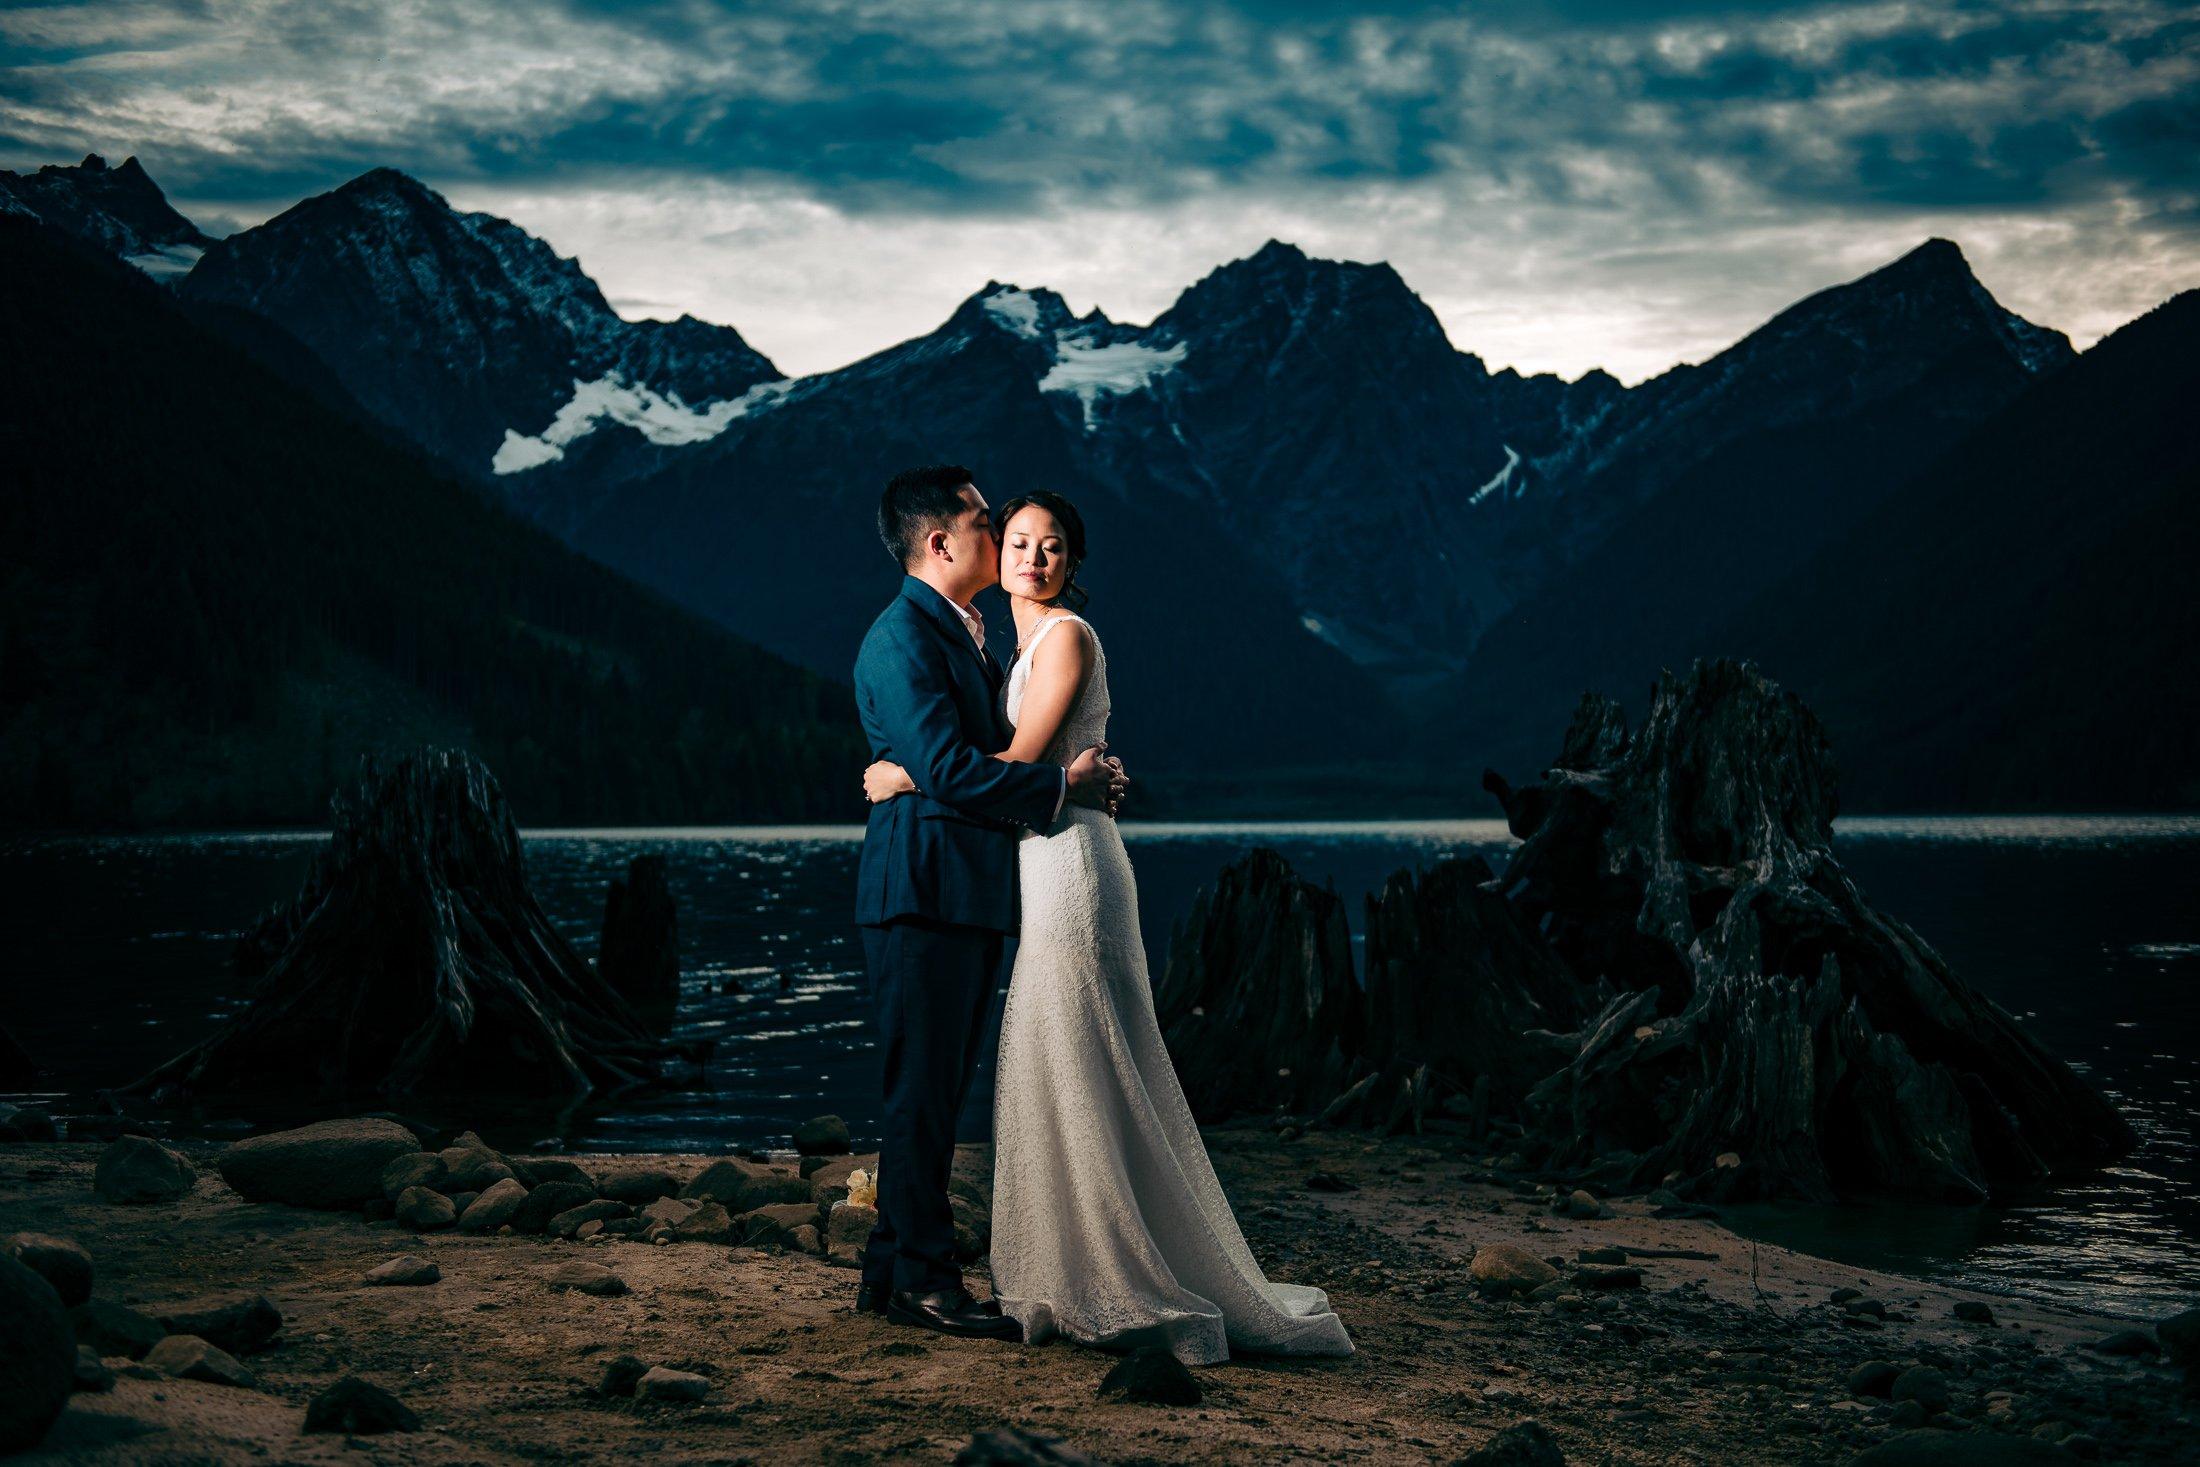 016 - mountain elopement bc